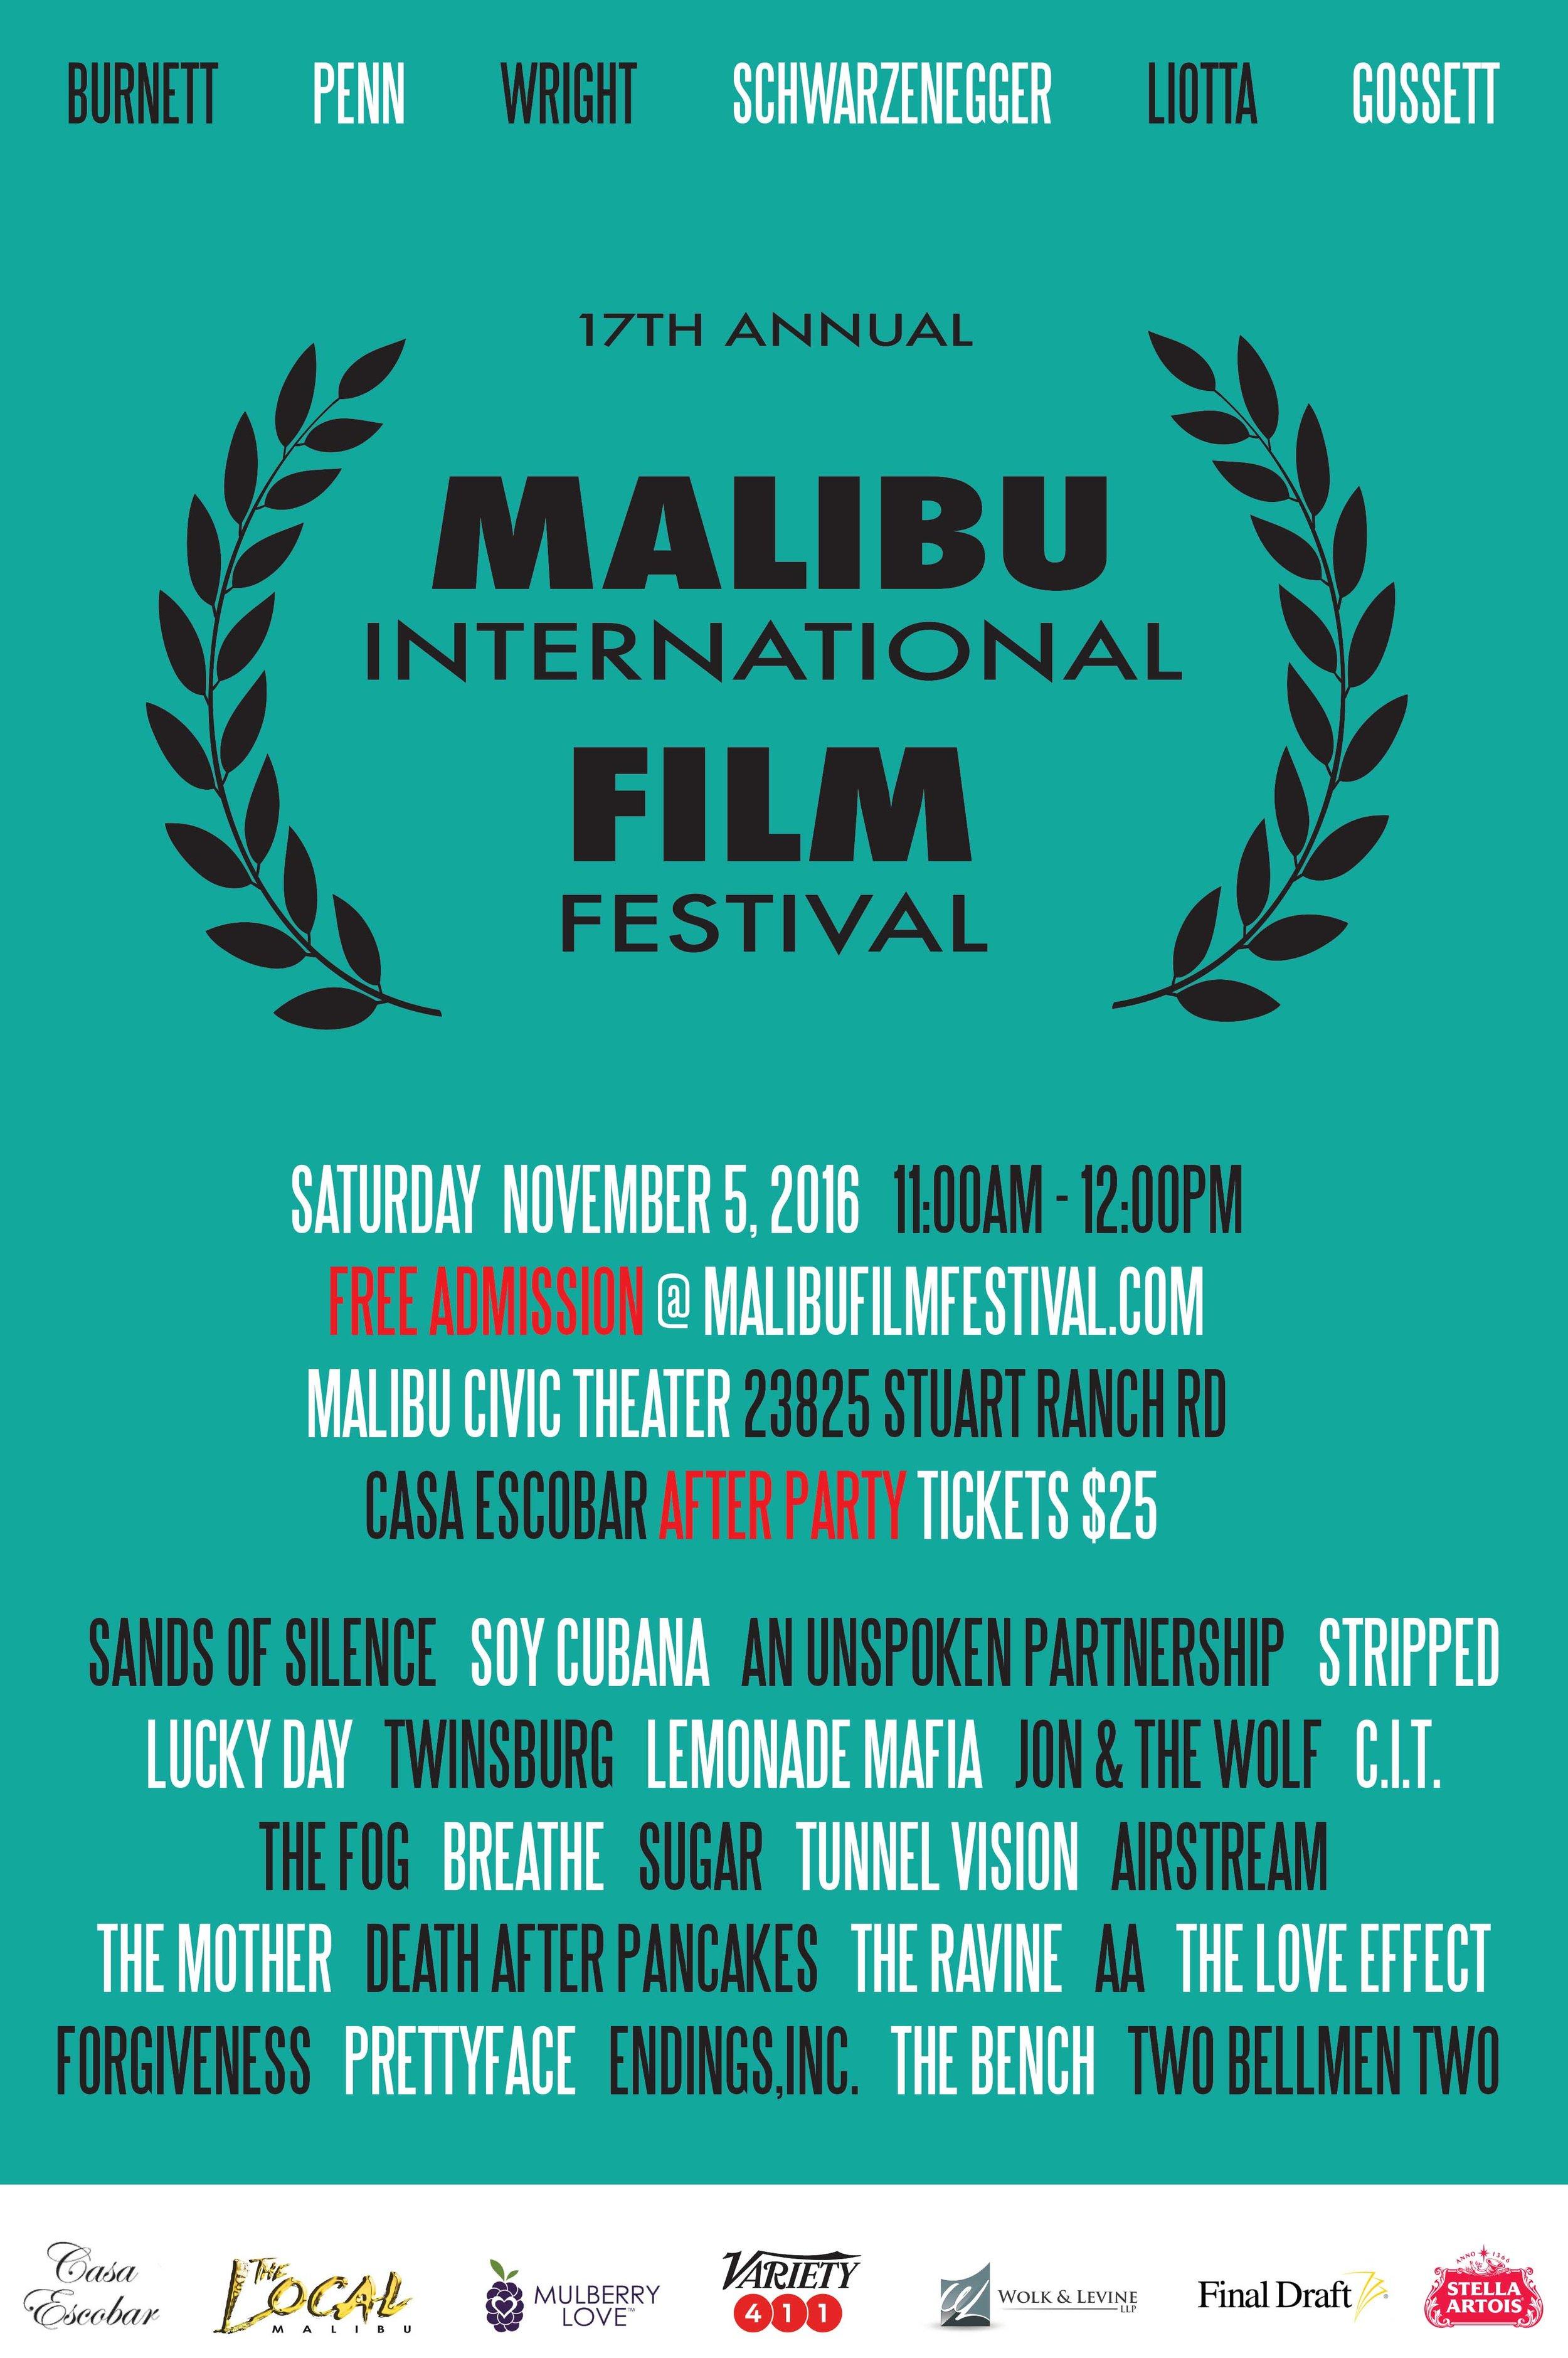 malibu-poster.jpg